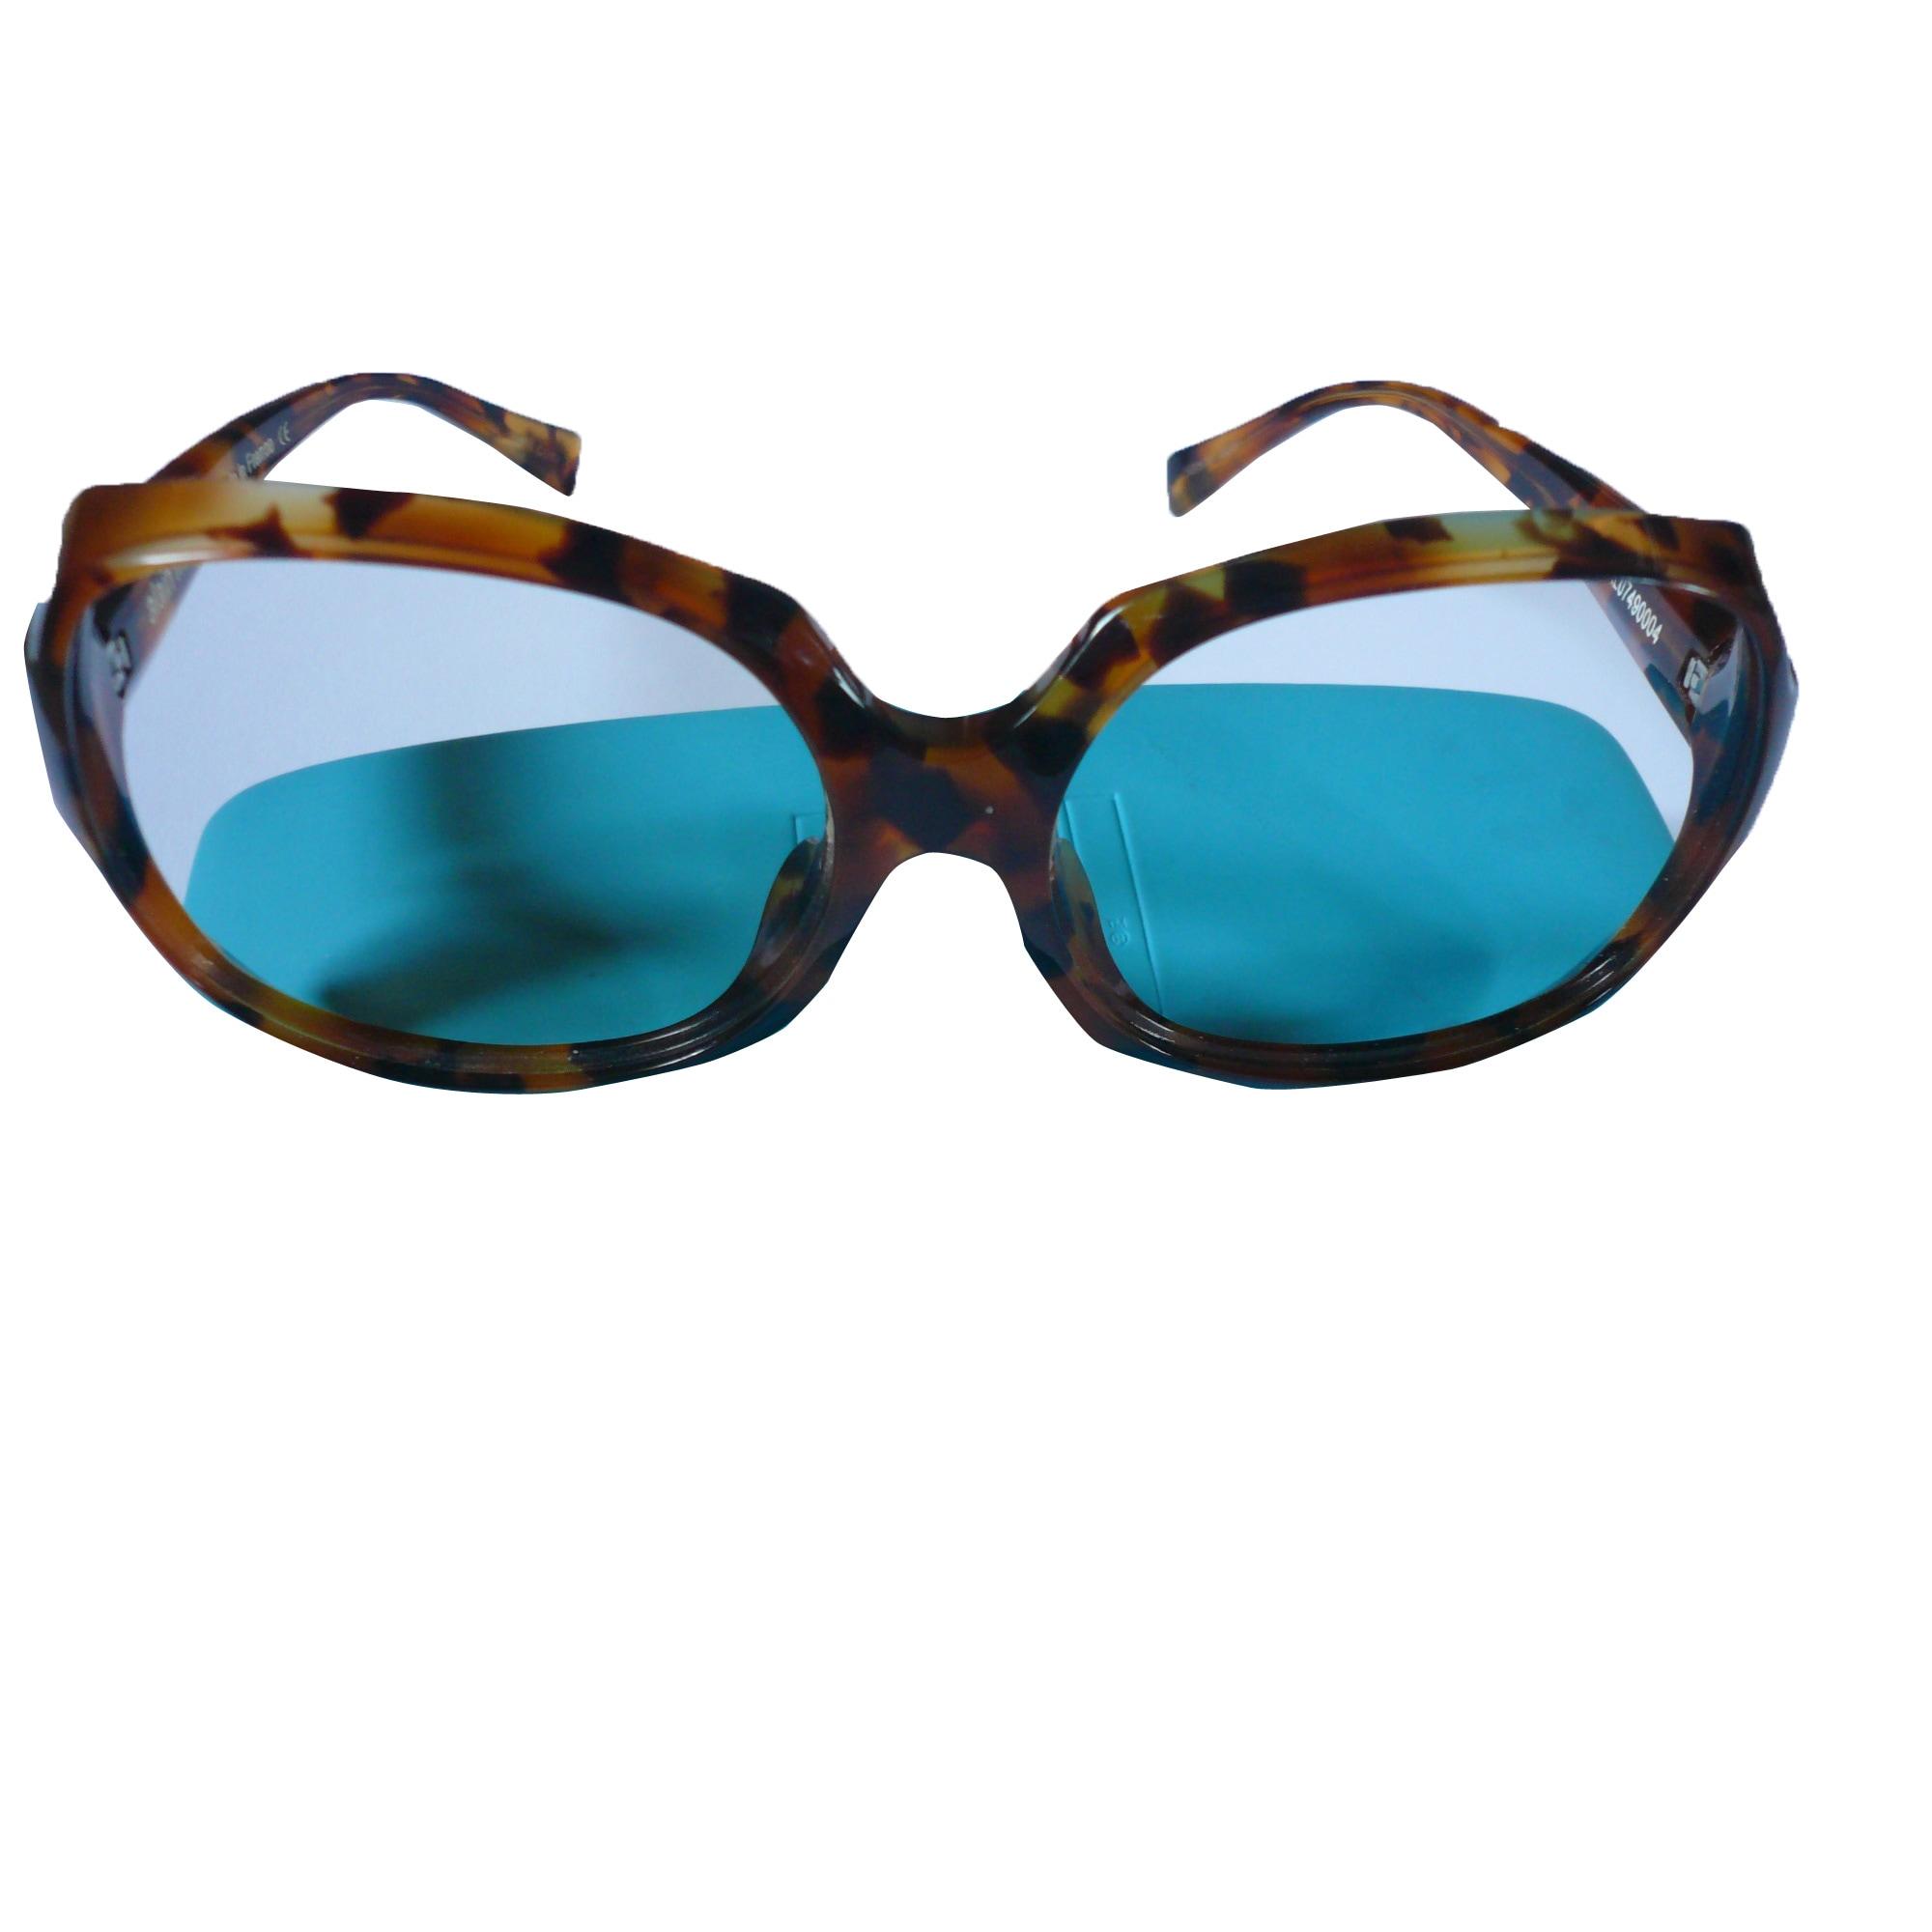 Eyeglass Frames ALAIN MIKLI brown - 8029812